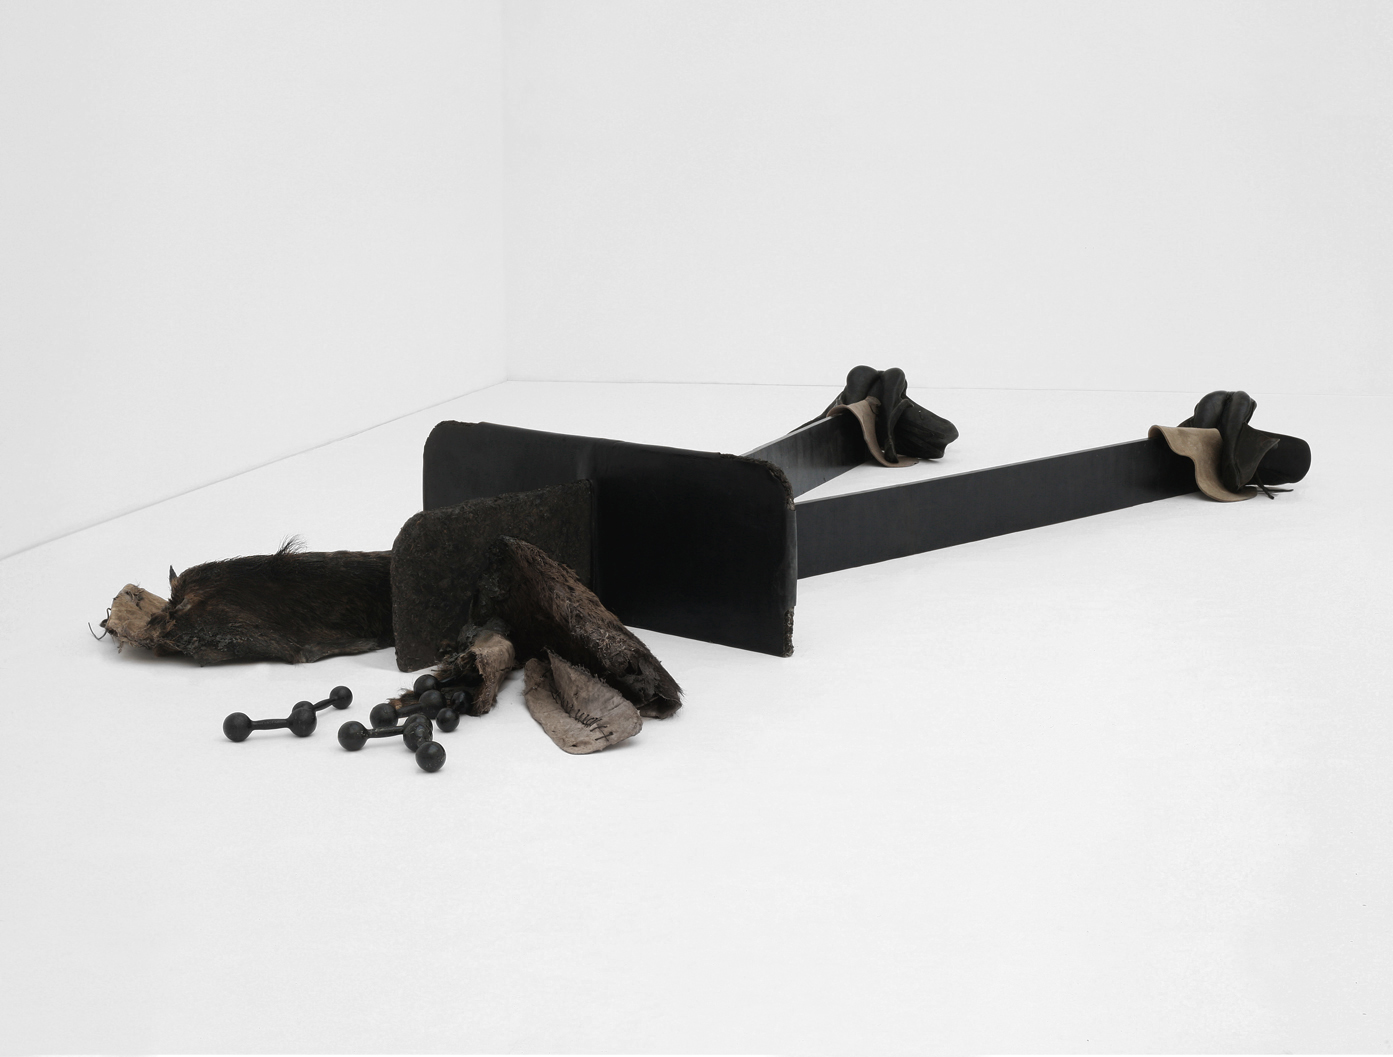 POSSESIA / Schism / 2010 / 700 x 250 x 70 cm /  fur, soil, steel, leather, weights, resin, wood, tar, saddles